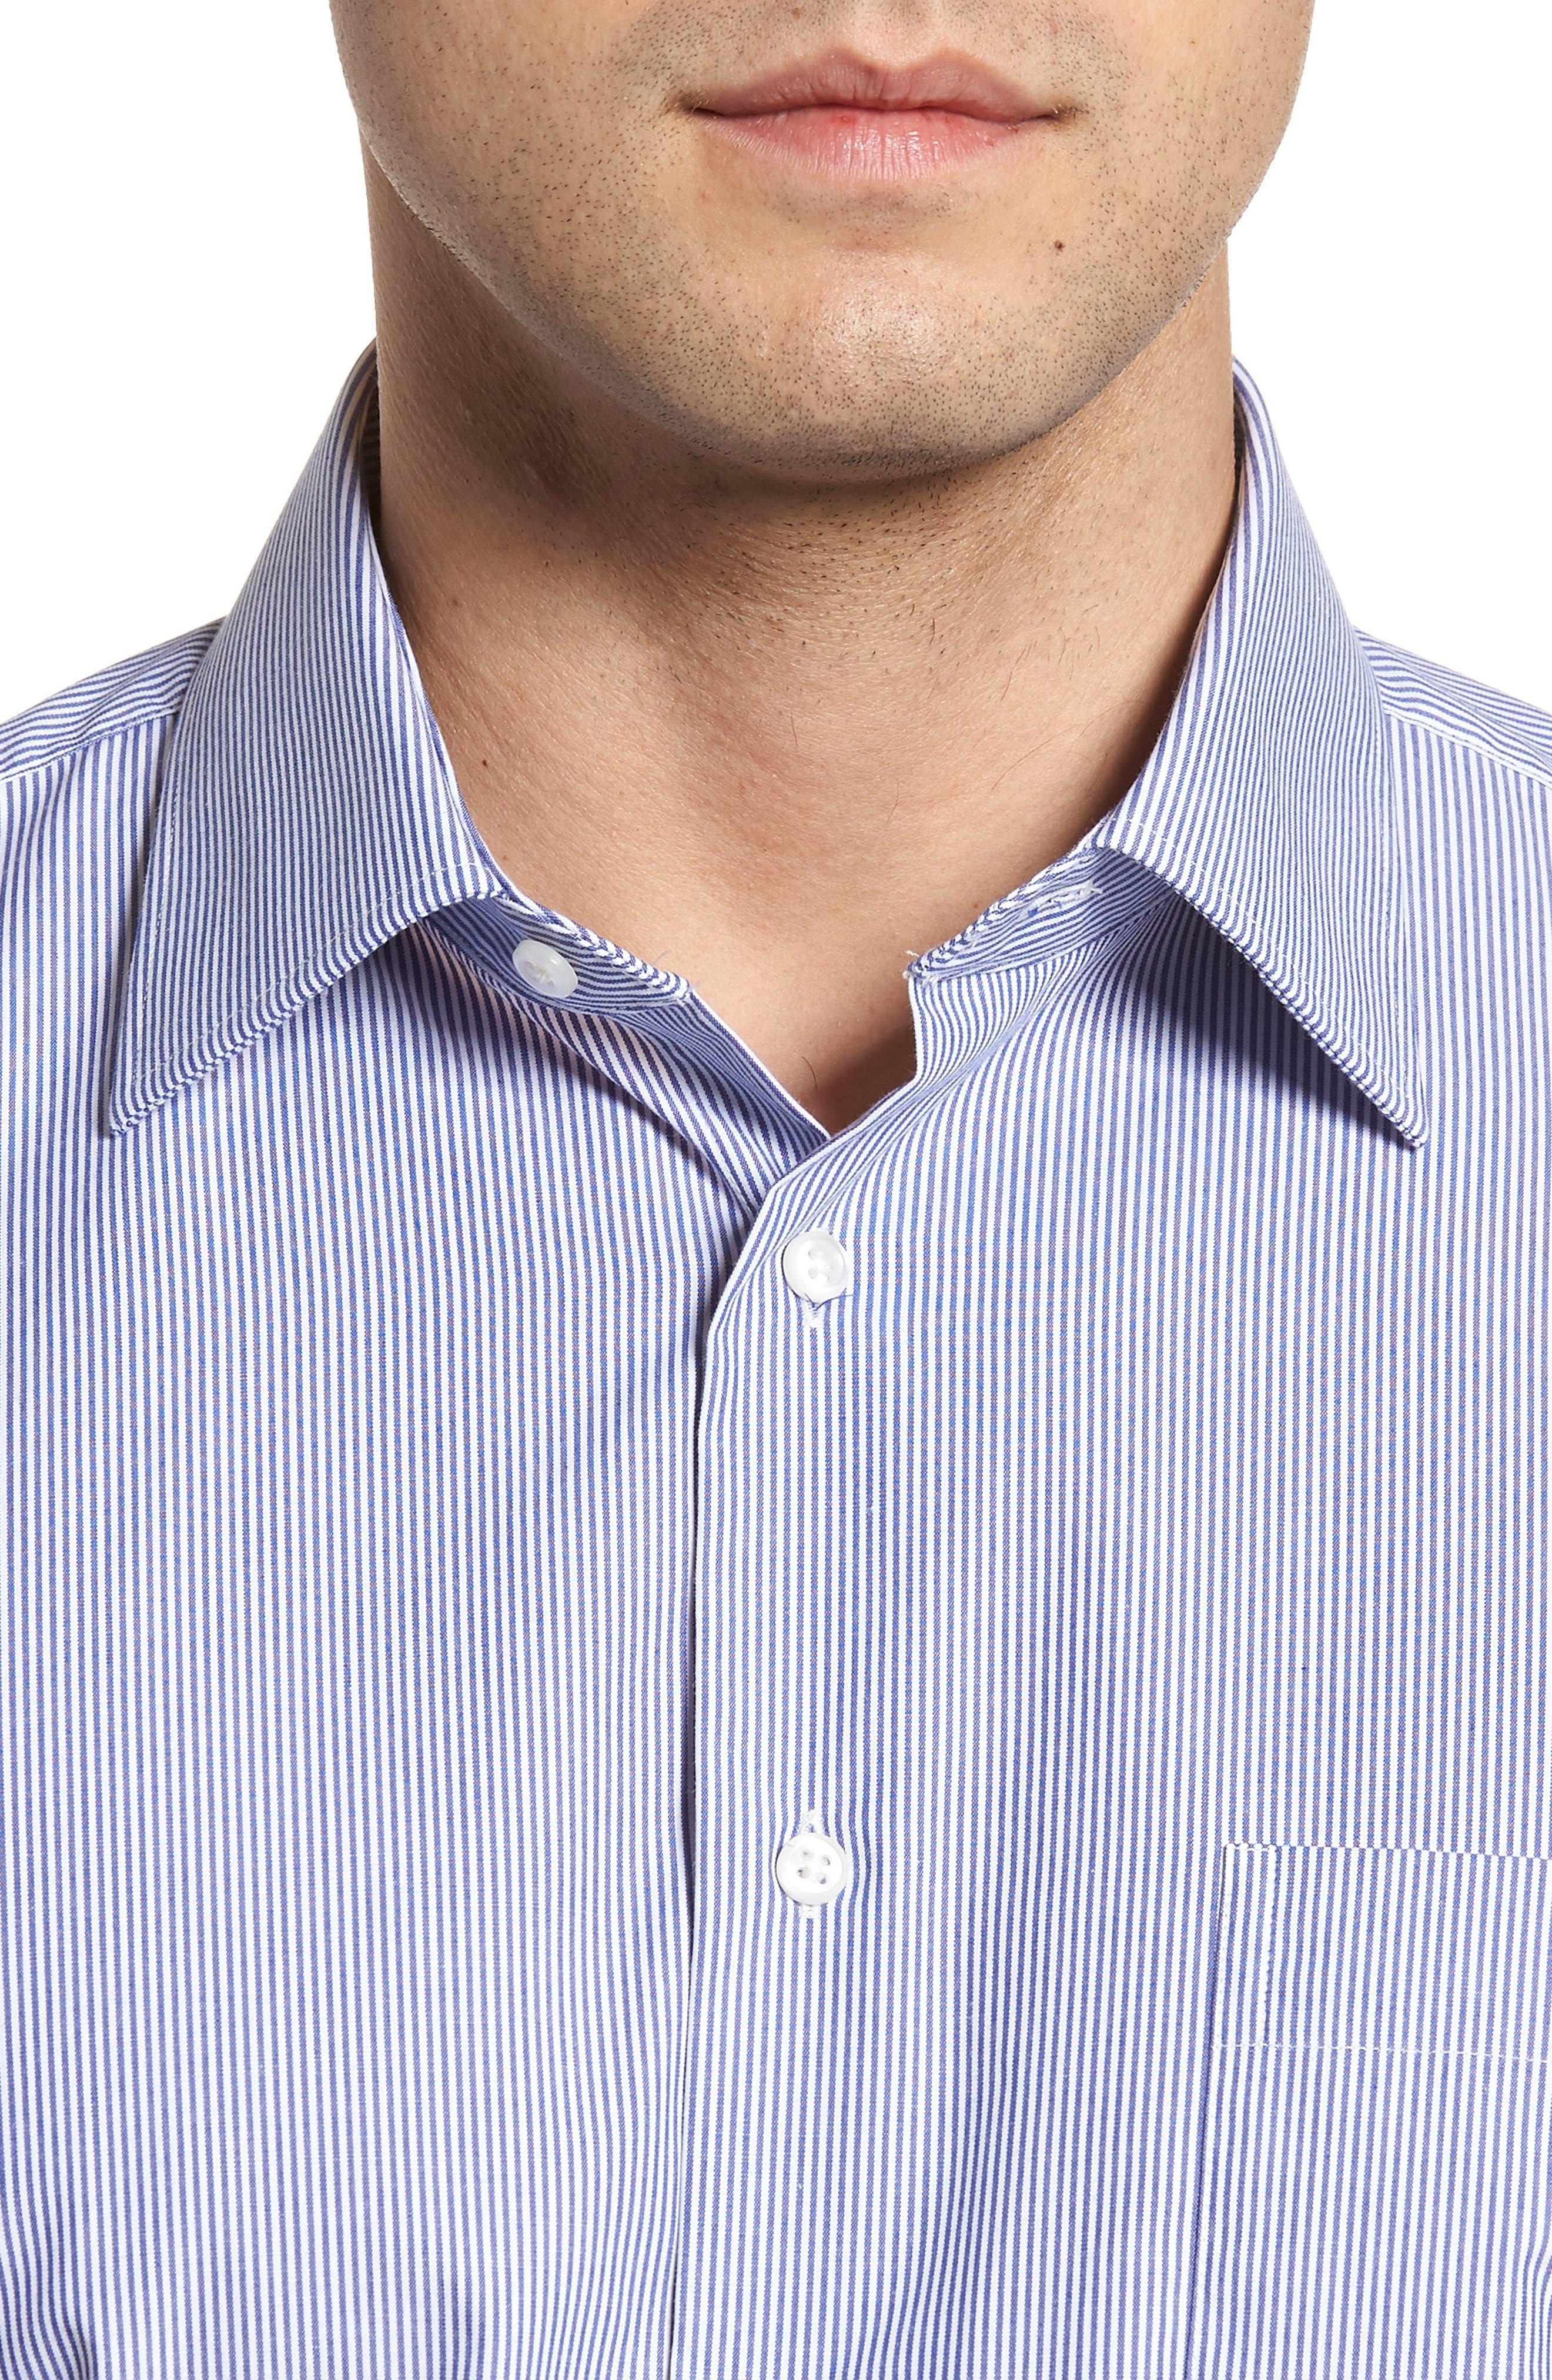 Classic Fit Non-Iron Stripe Dress Shirt,                             Alternate thumbnail 2, color,                             Navy Dusk